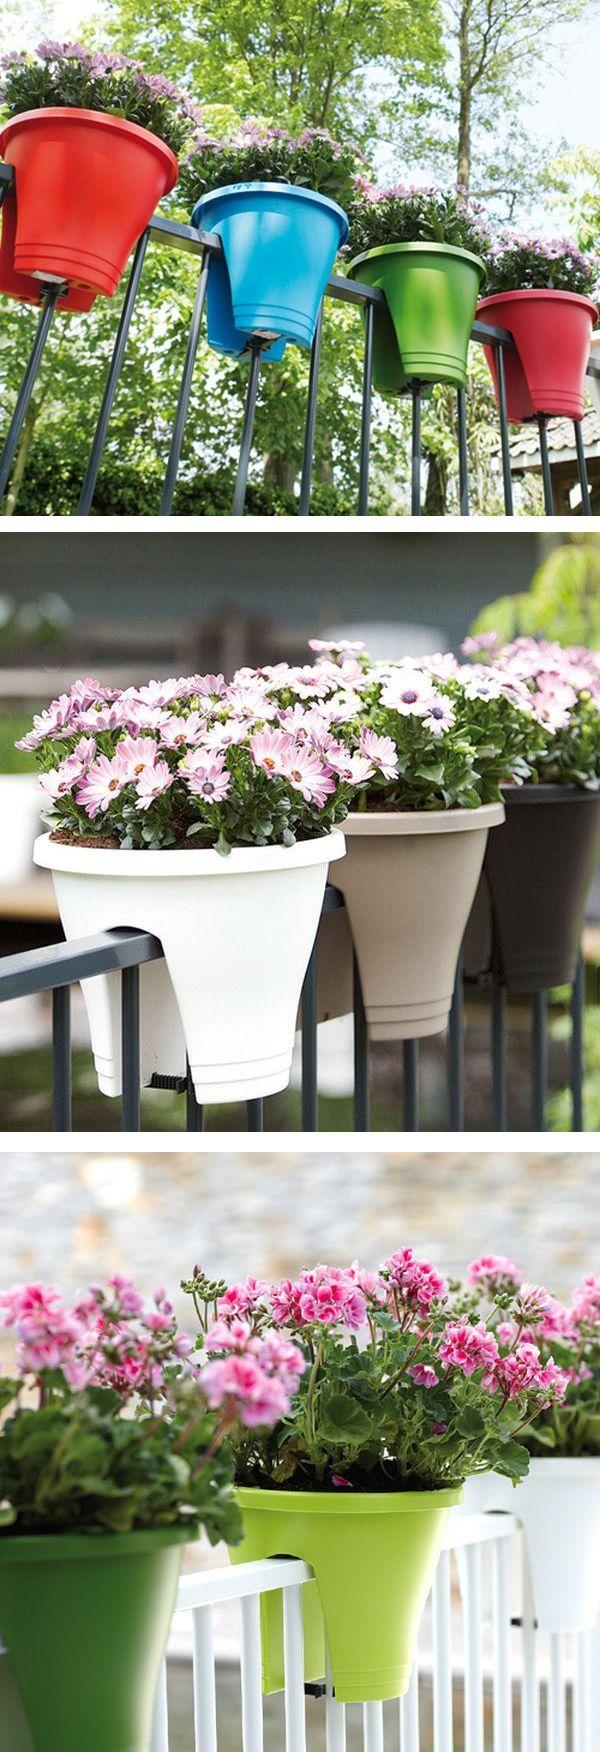 Best 25+ Balcony railing planters ideas on Pinterest   Railing ...